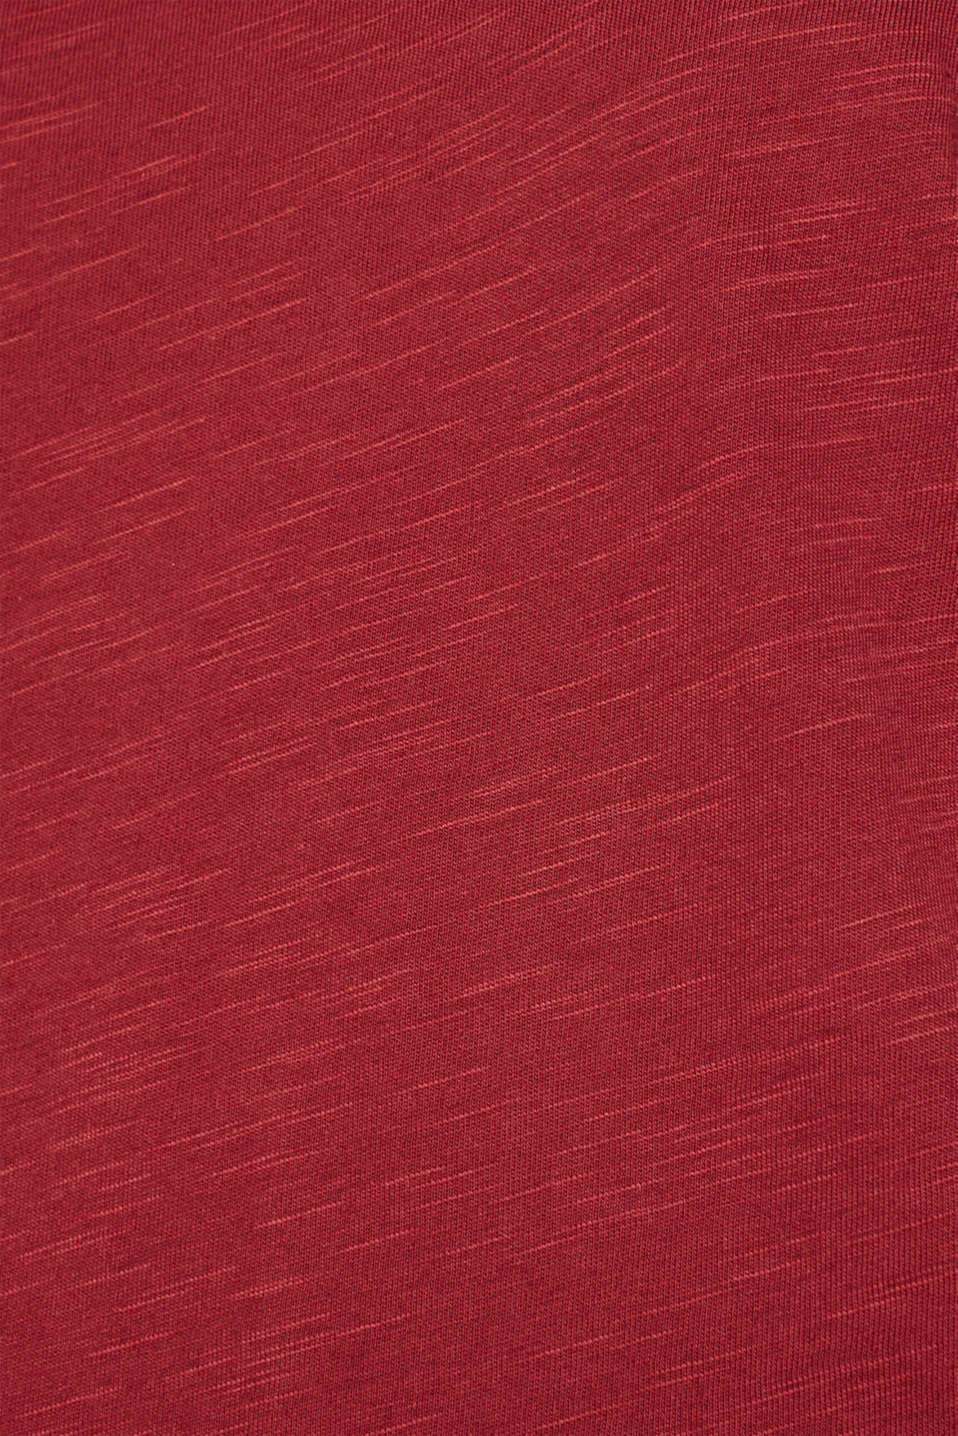 Slub top with a statement print, GARNET RED, detail image number 4